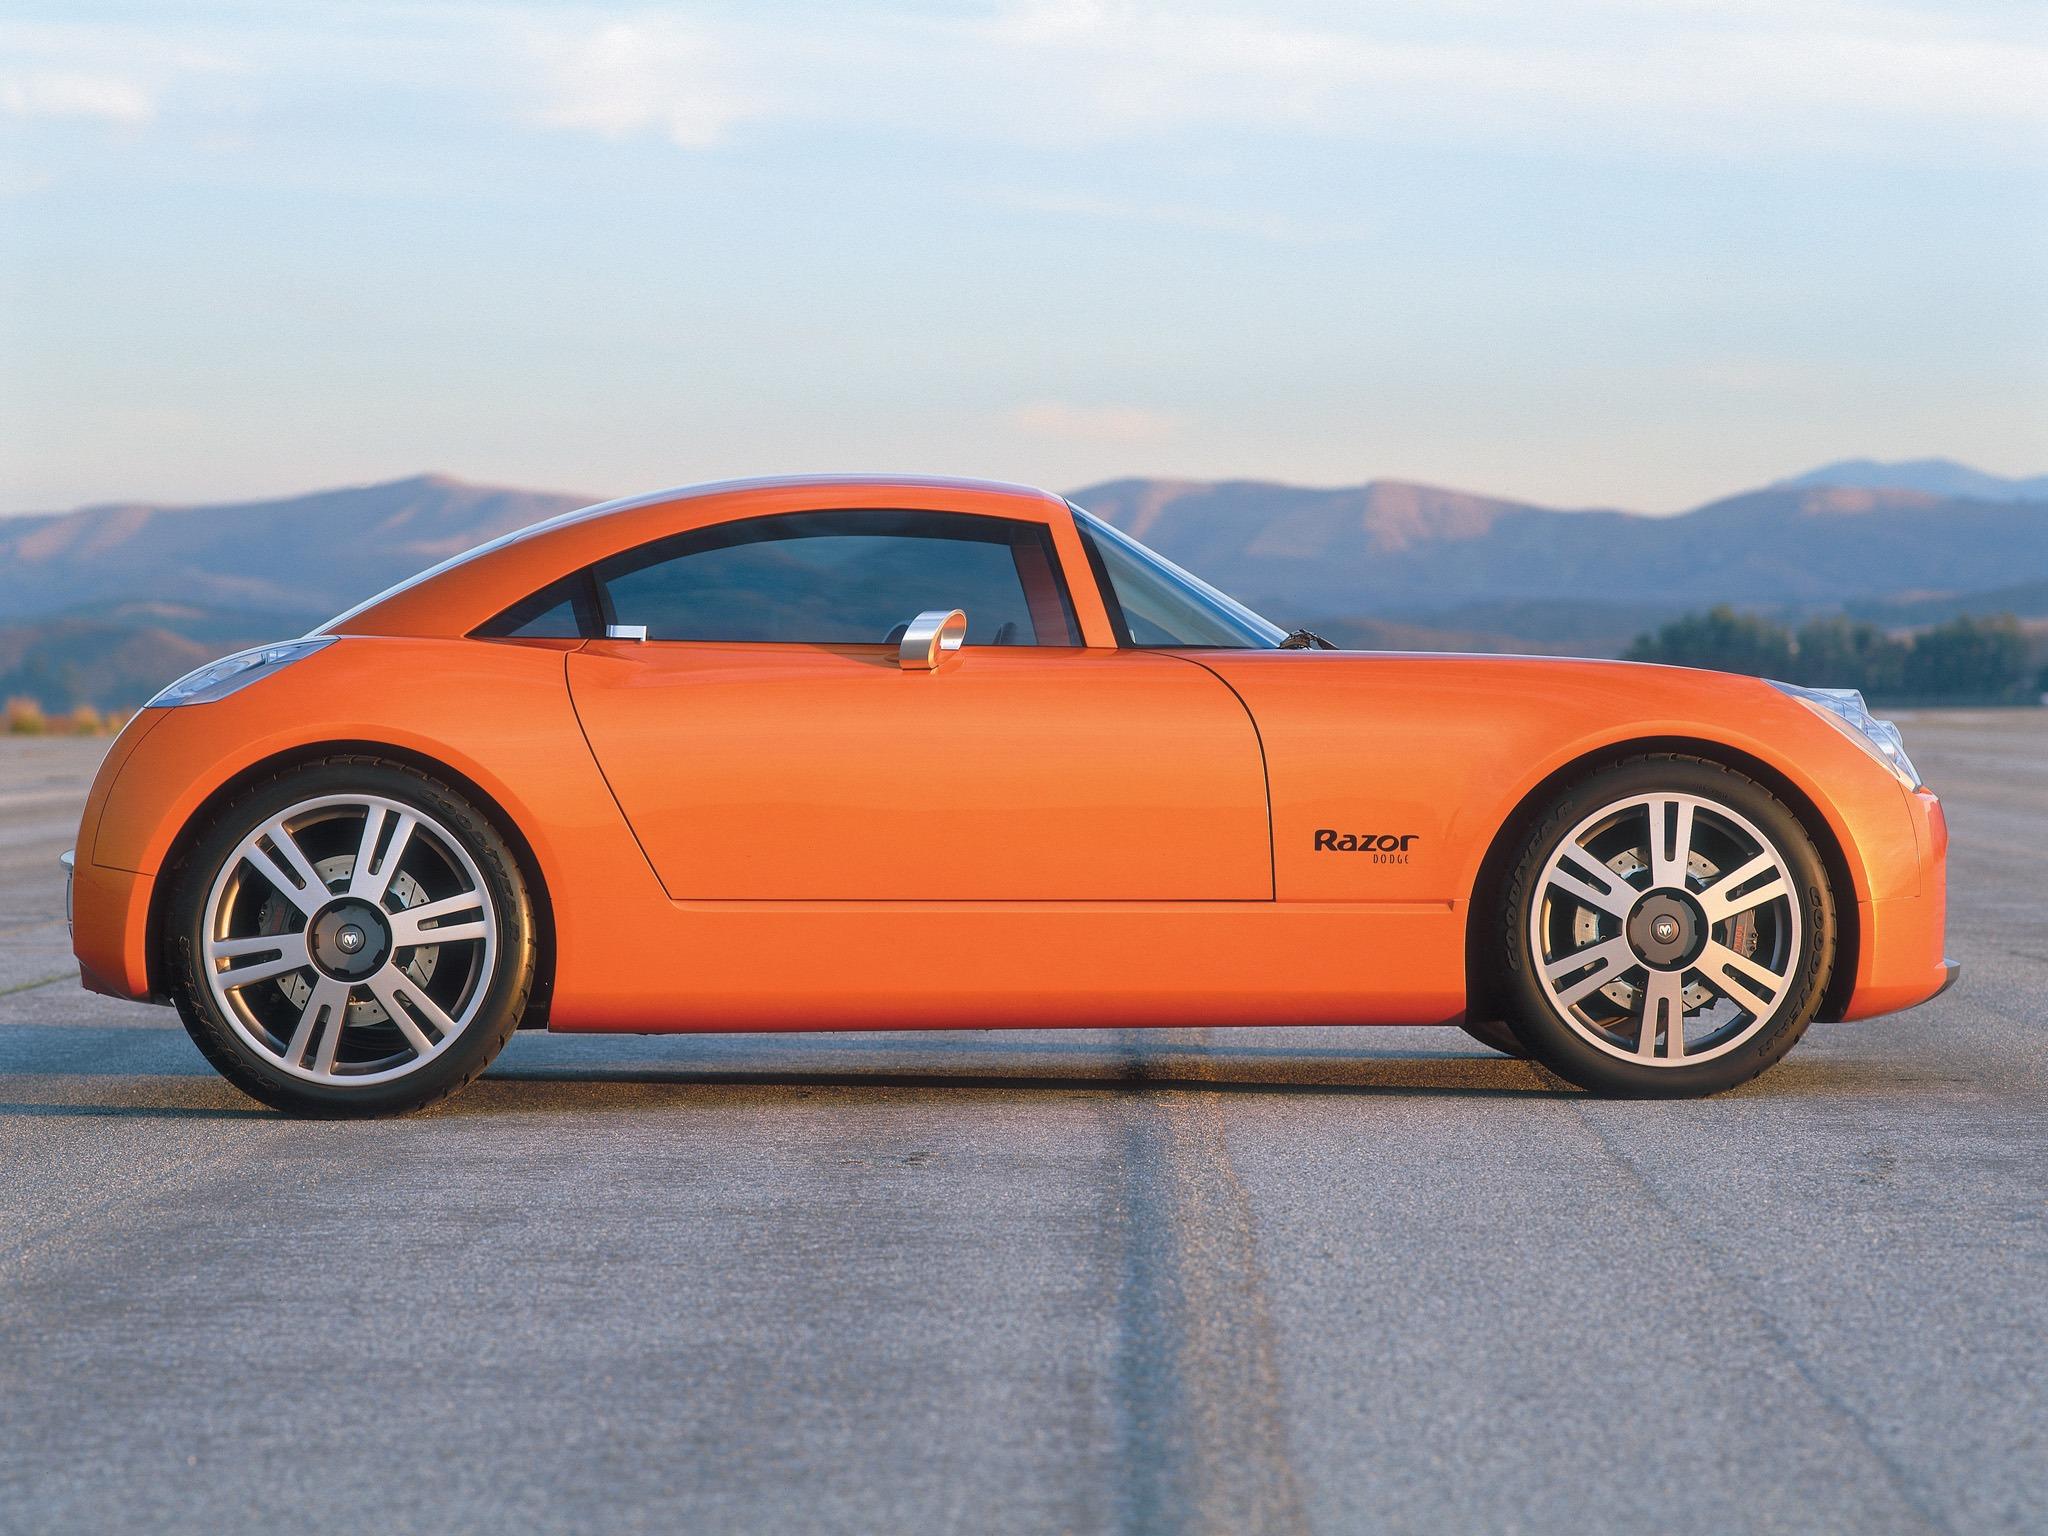 Top 10 Fastest Cars >> Dodge Razor Concept (2002) – Old Concept Cars